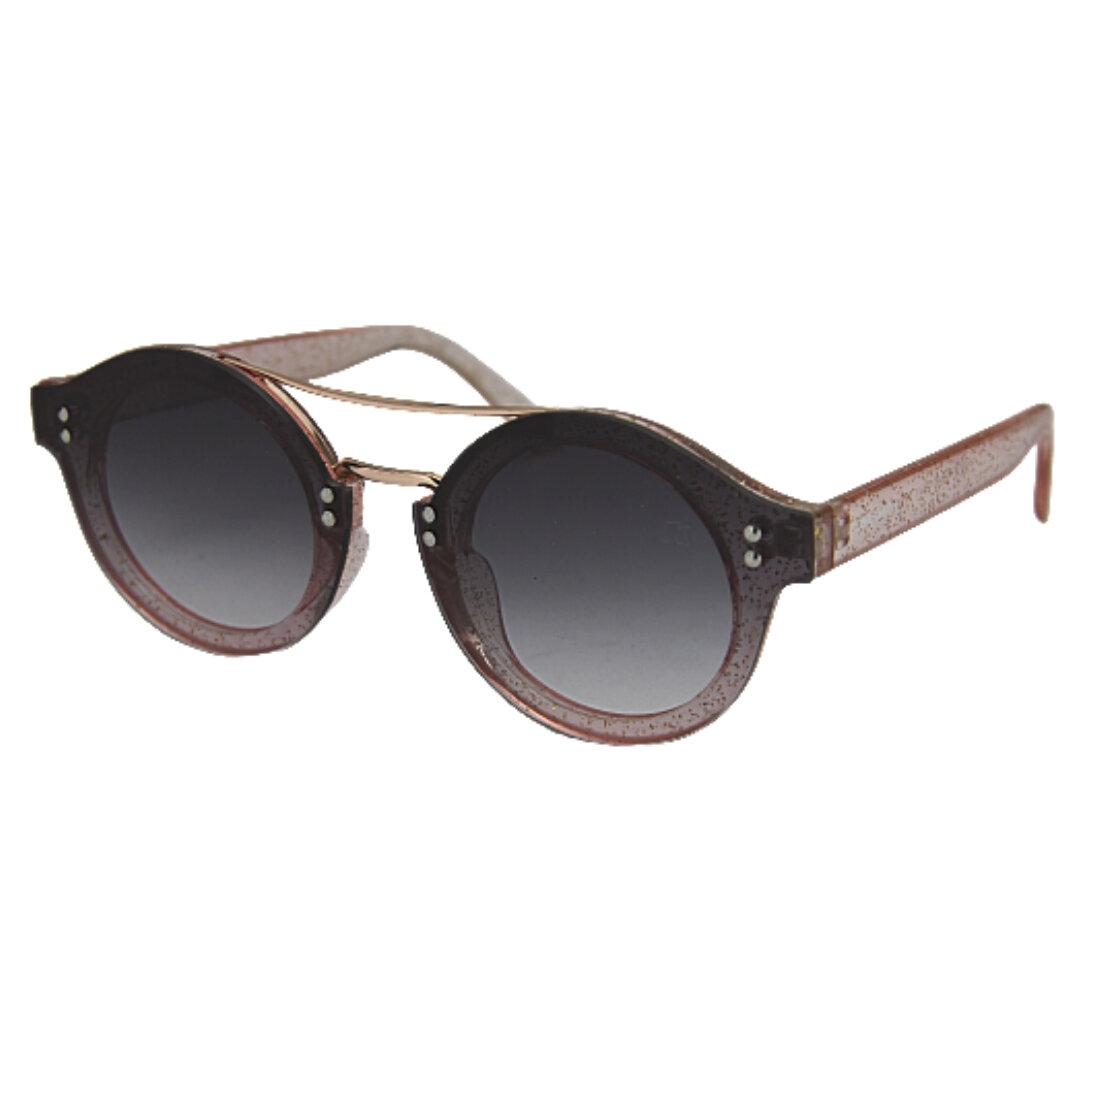 OUTLET - Óculos de Sol Khatto Round Glitter - Preto e Rosê